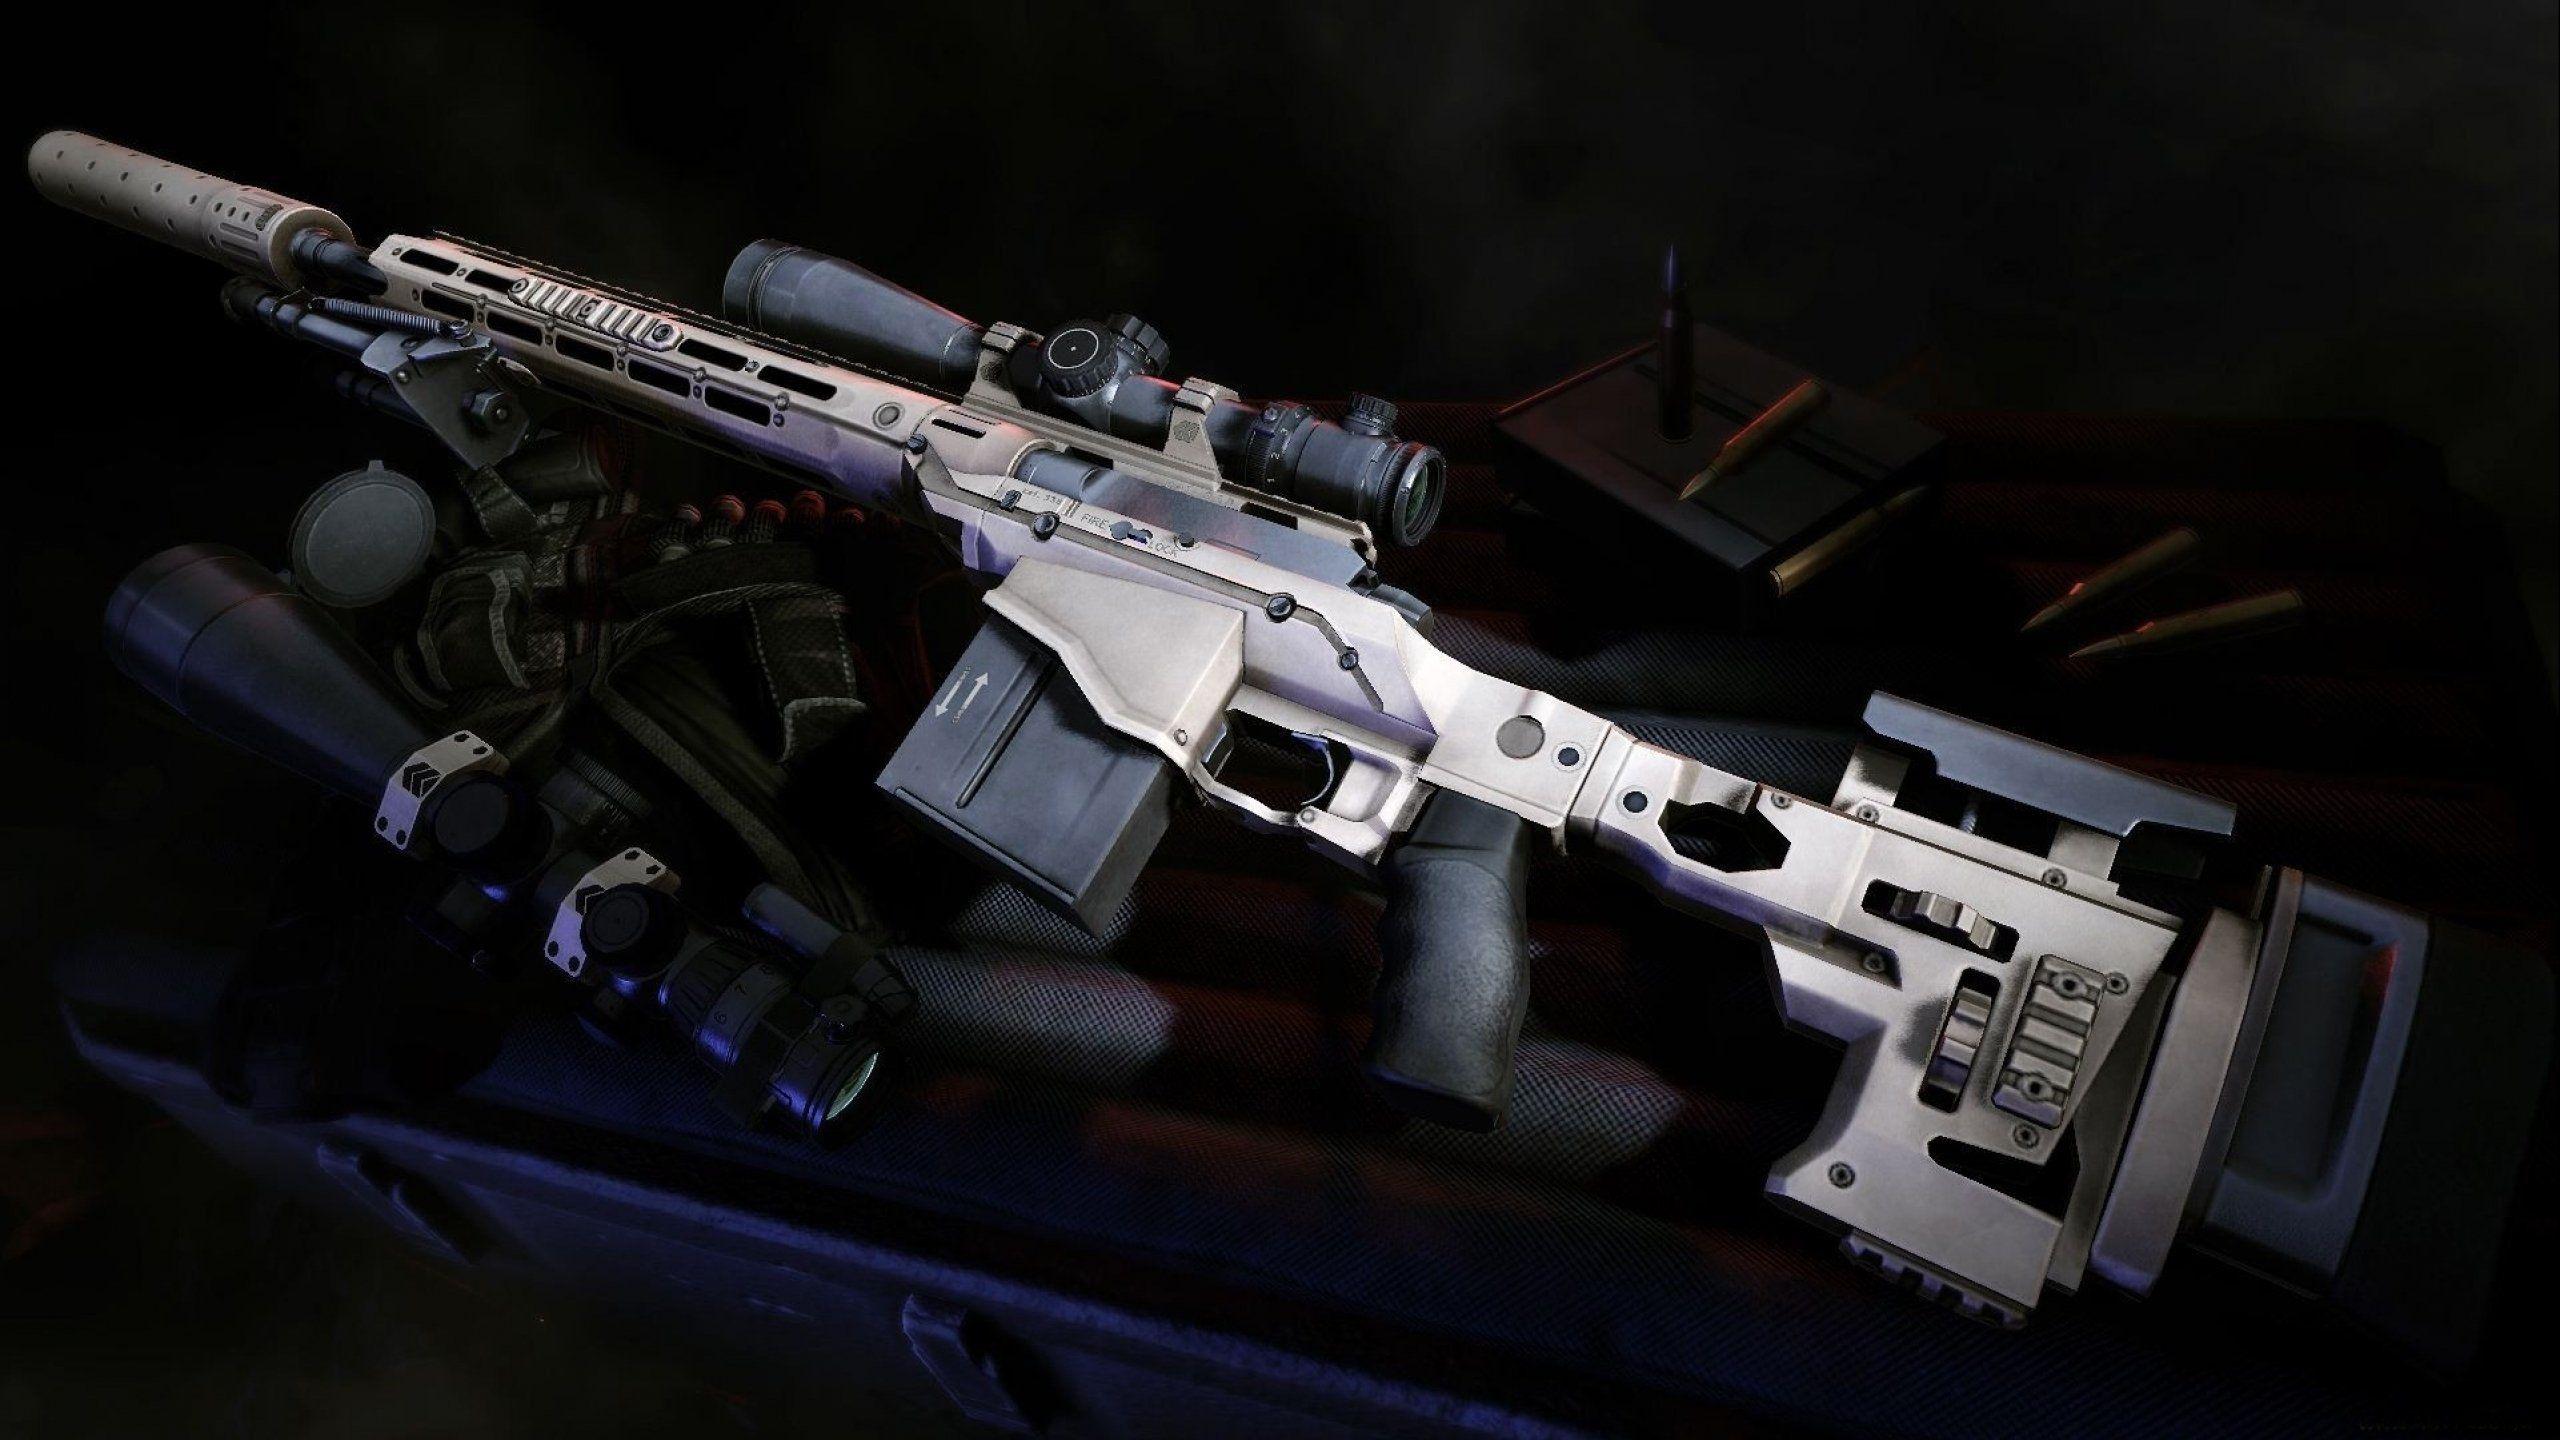 Pin On Gun Stuff I Like